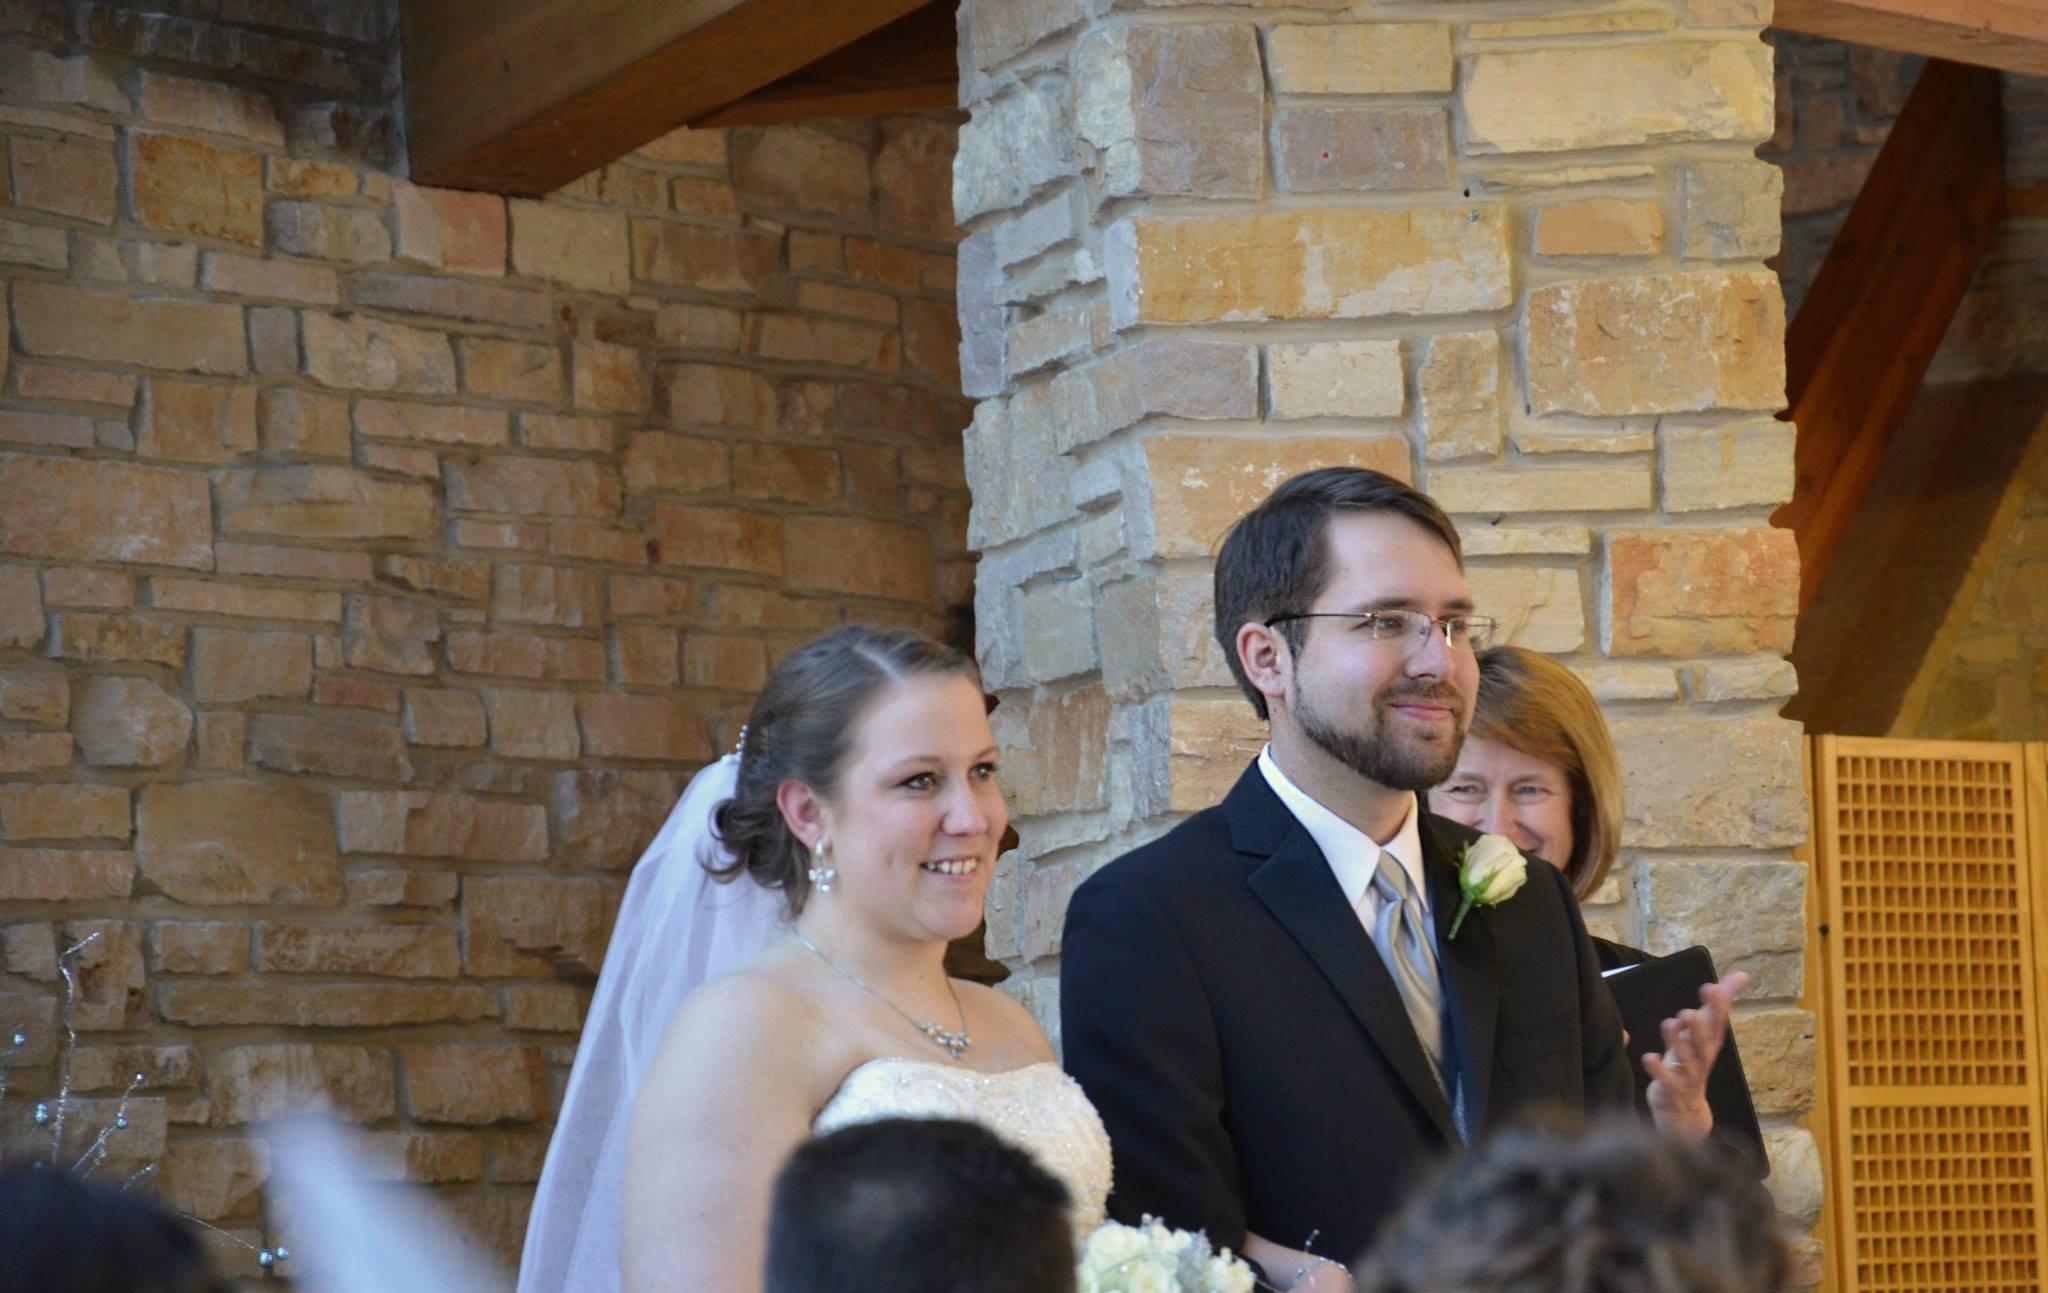 Alesha's Sister Got Married